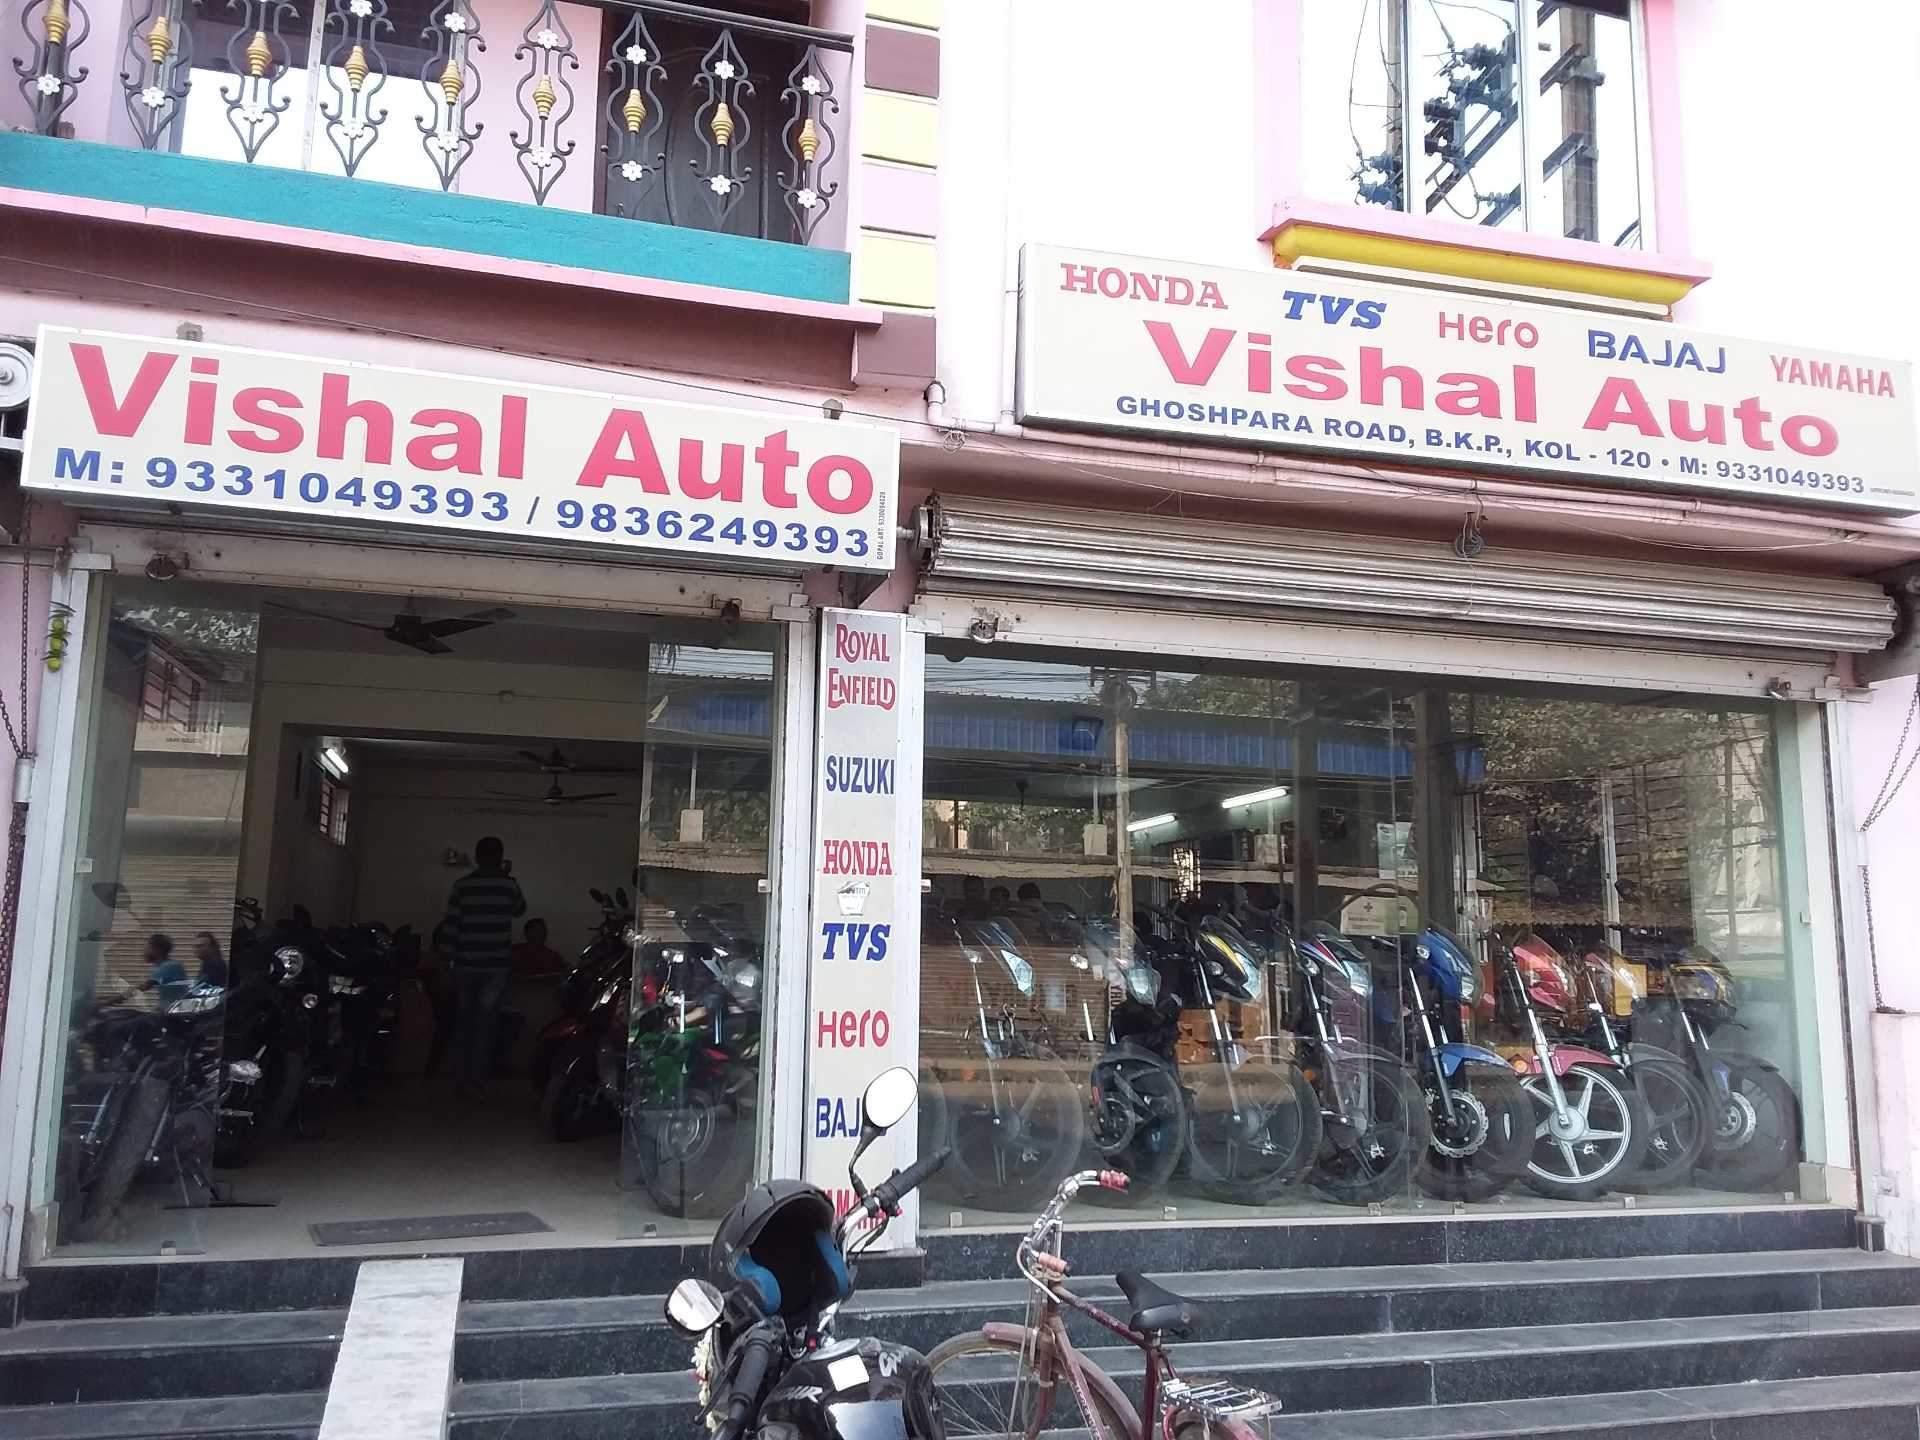 Vishal Auto Barrackpore Motorcycle Dealers In Kolkata Justdial